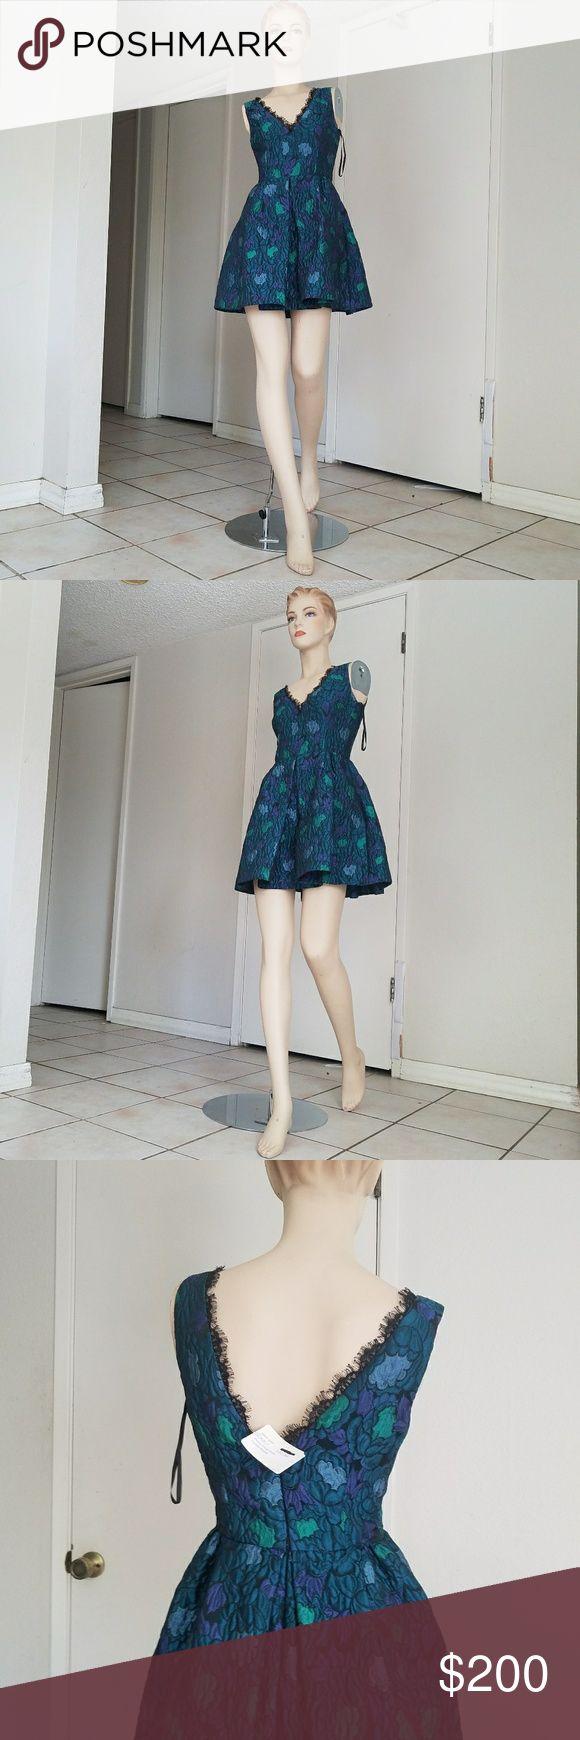 $440 NWT Cythia Rowley jacquard New with tag short dress size 2 check my listing for Bebe, Bcbg, Versace, Anthropologie chanel bag sachin babi halston heritage Cynthia Rowley Dresses Mini